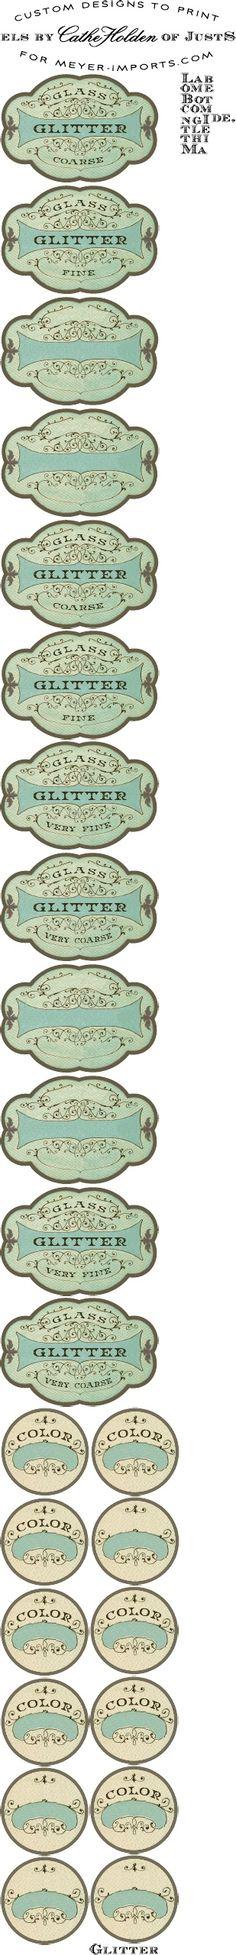 JSIM Glitter Bottle Labels (See more glitter labels in my Graphix Labels board, Ty Ammamazy) - DIY Homer Printable Labels, Printable Paper, Printables, Glitter Lips, Green Glitter, Glitter Stars, Bottle Labels, Bottle Packaging, Beer Labels